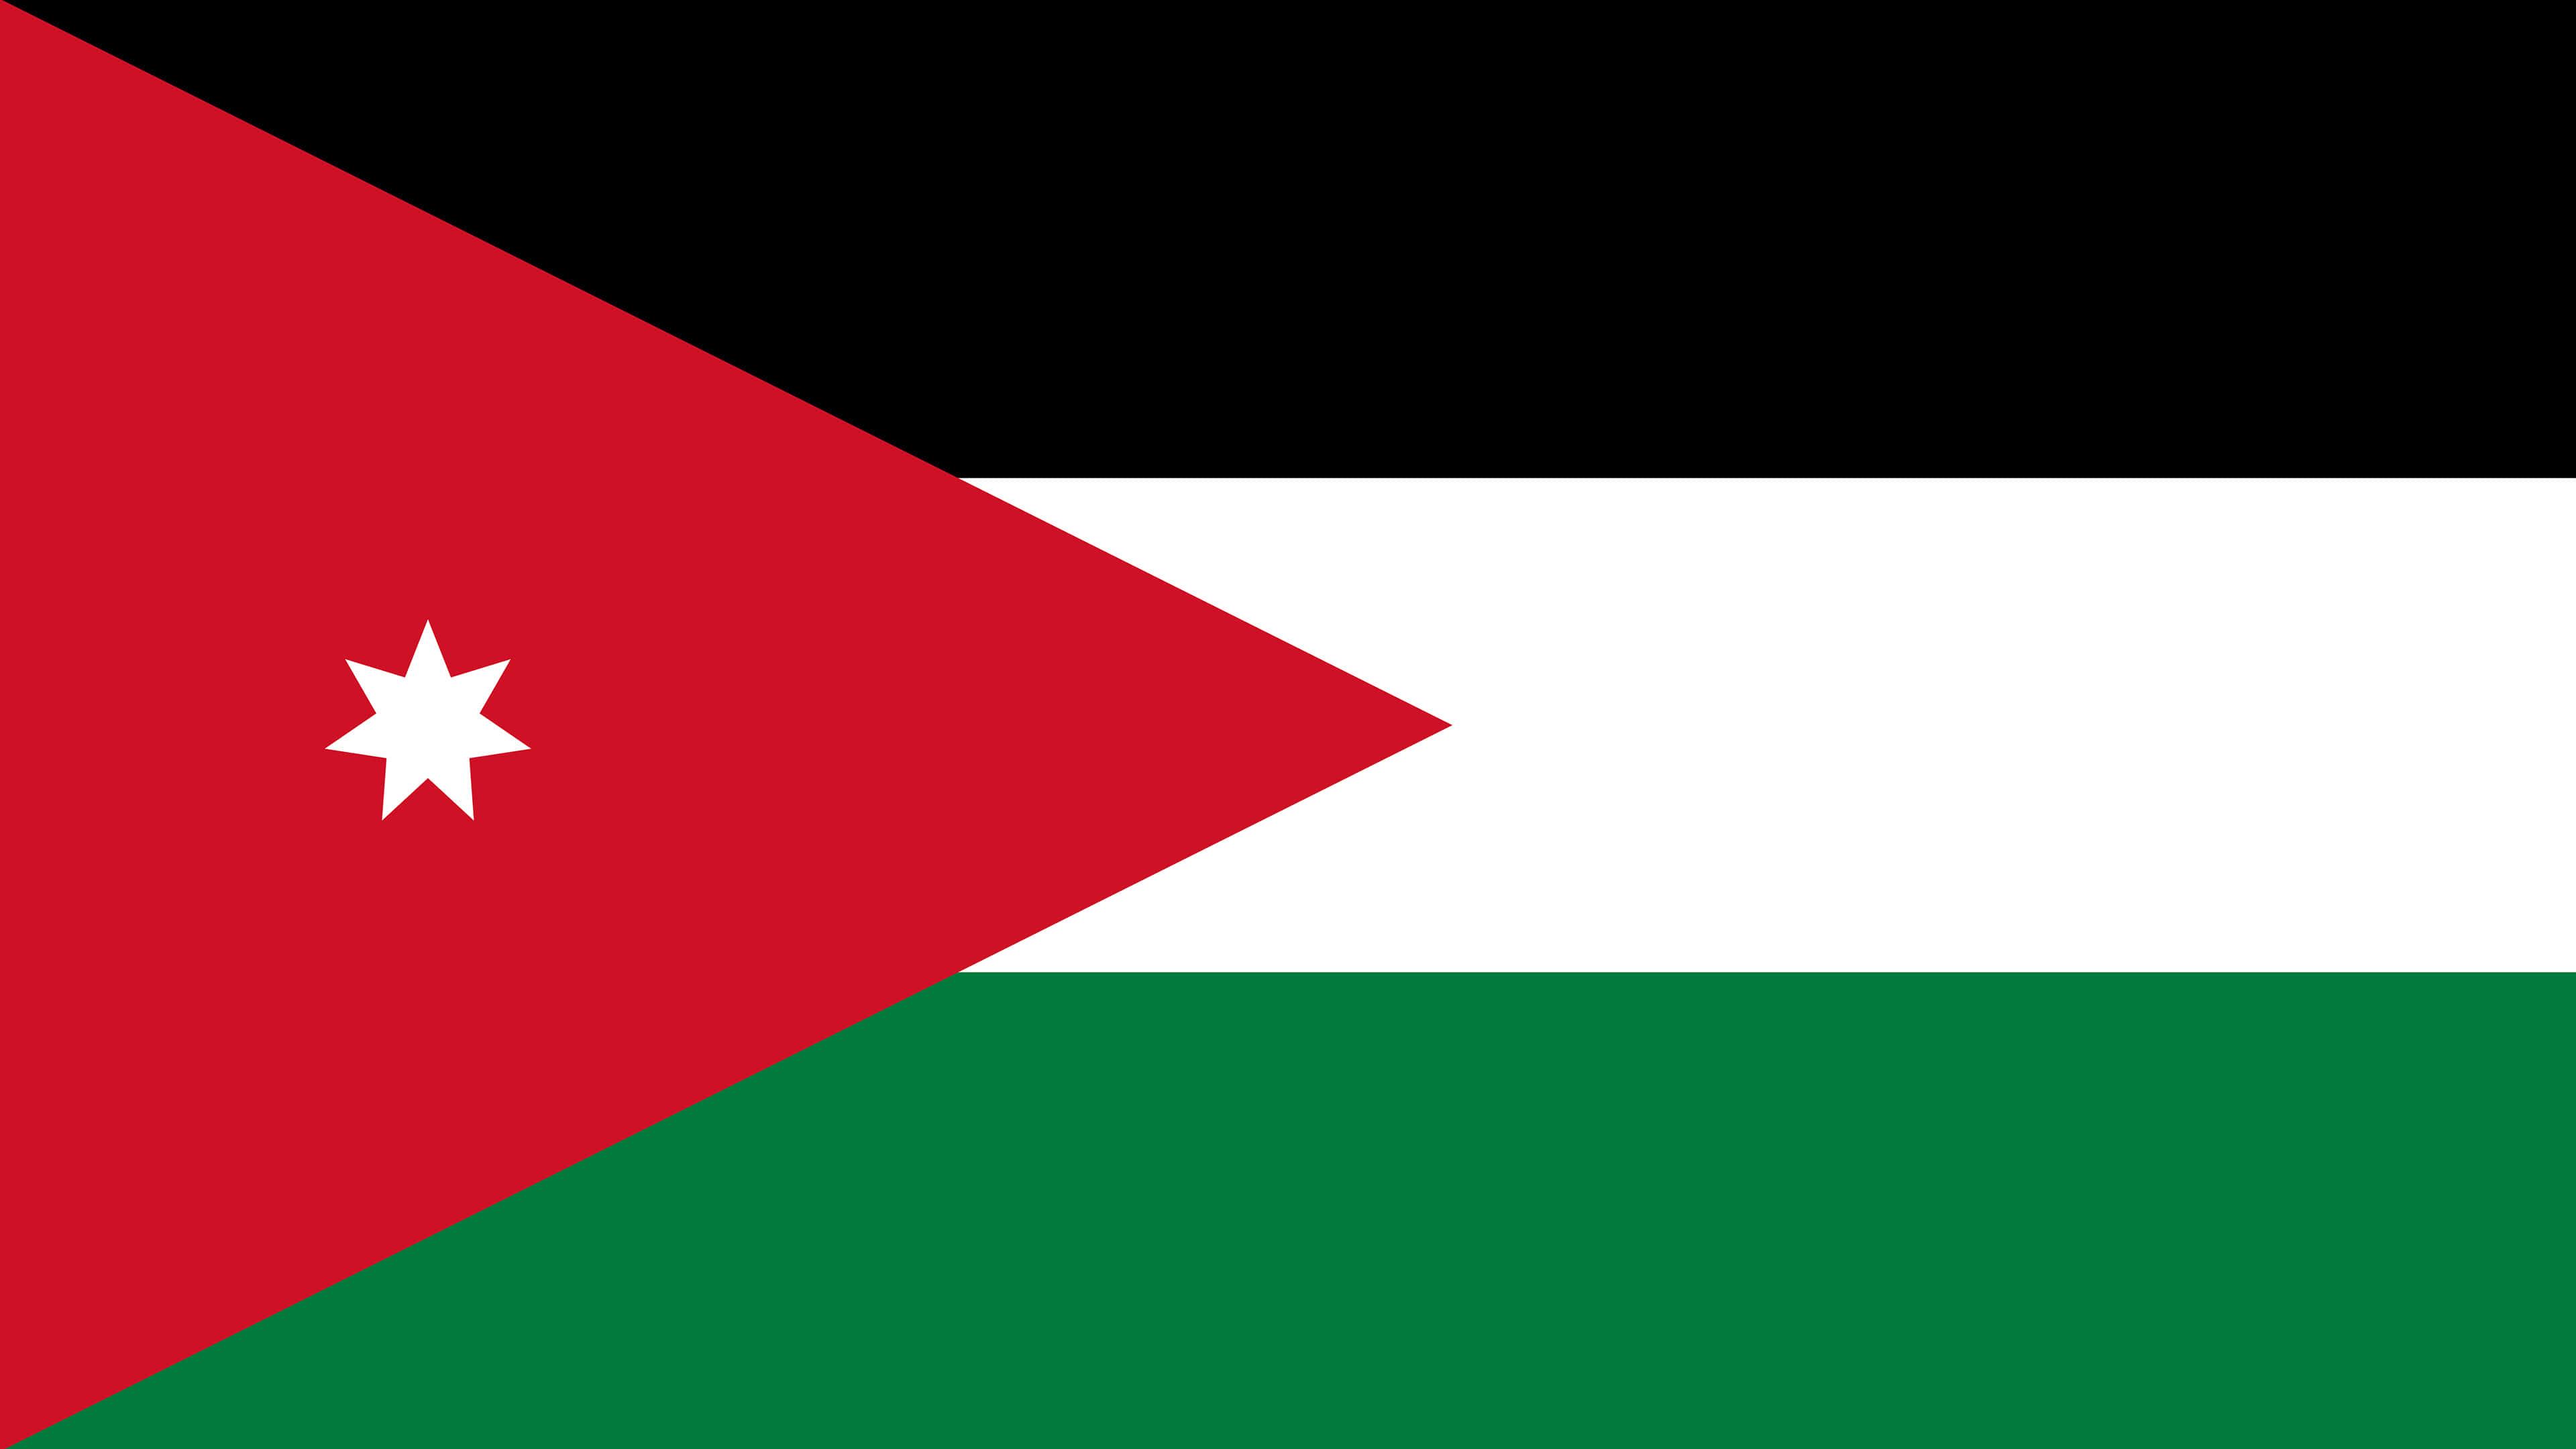 jordan flag uhd 4k wallpaper